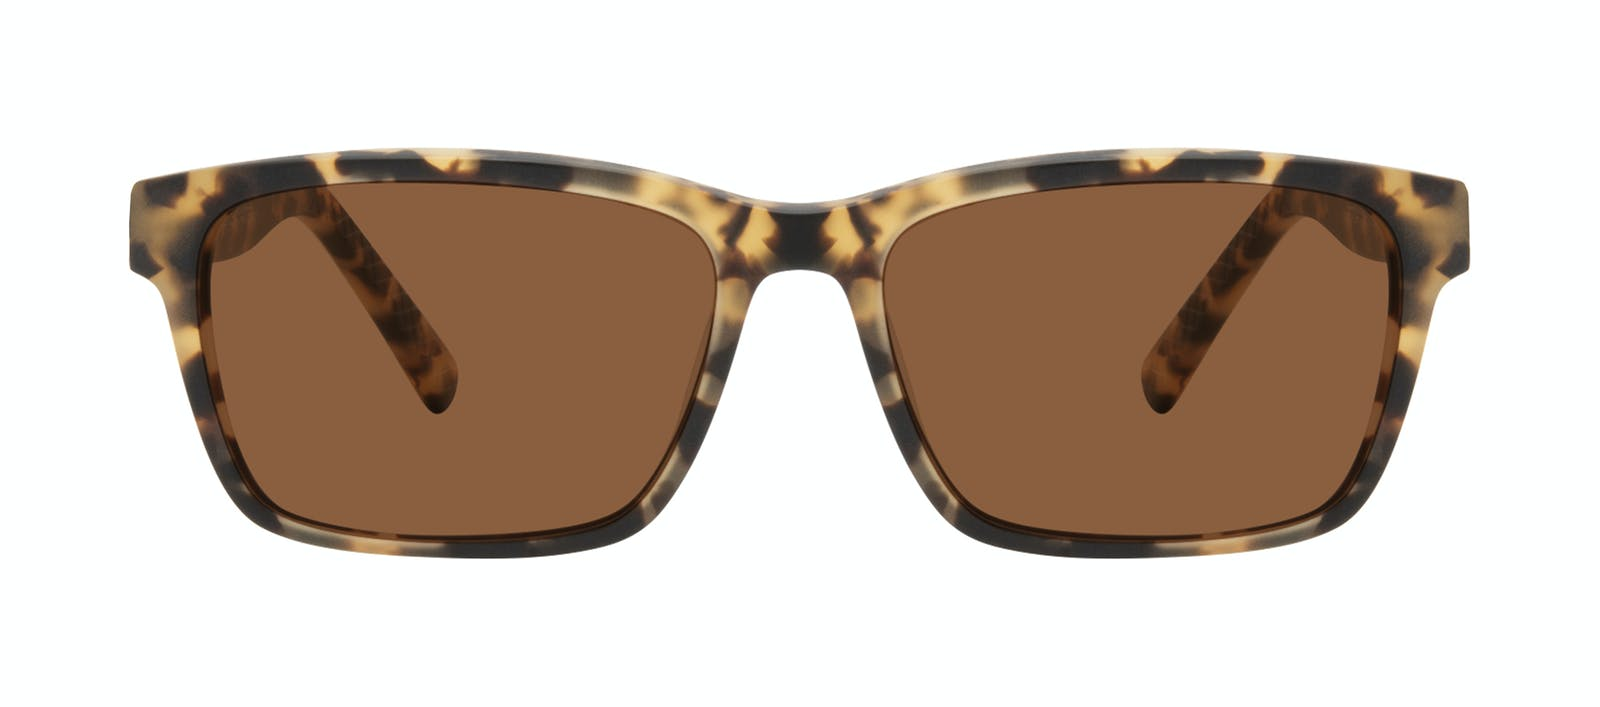 24f11cfa8d Affordable Fashion Glasses Square Sunglasses Men Chief Tortoise Matte Front